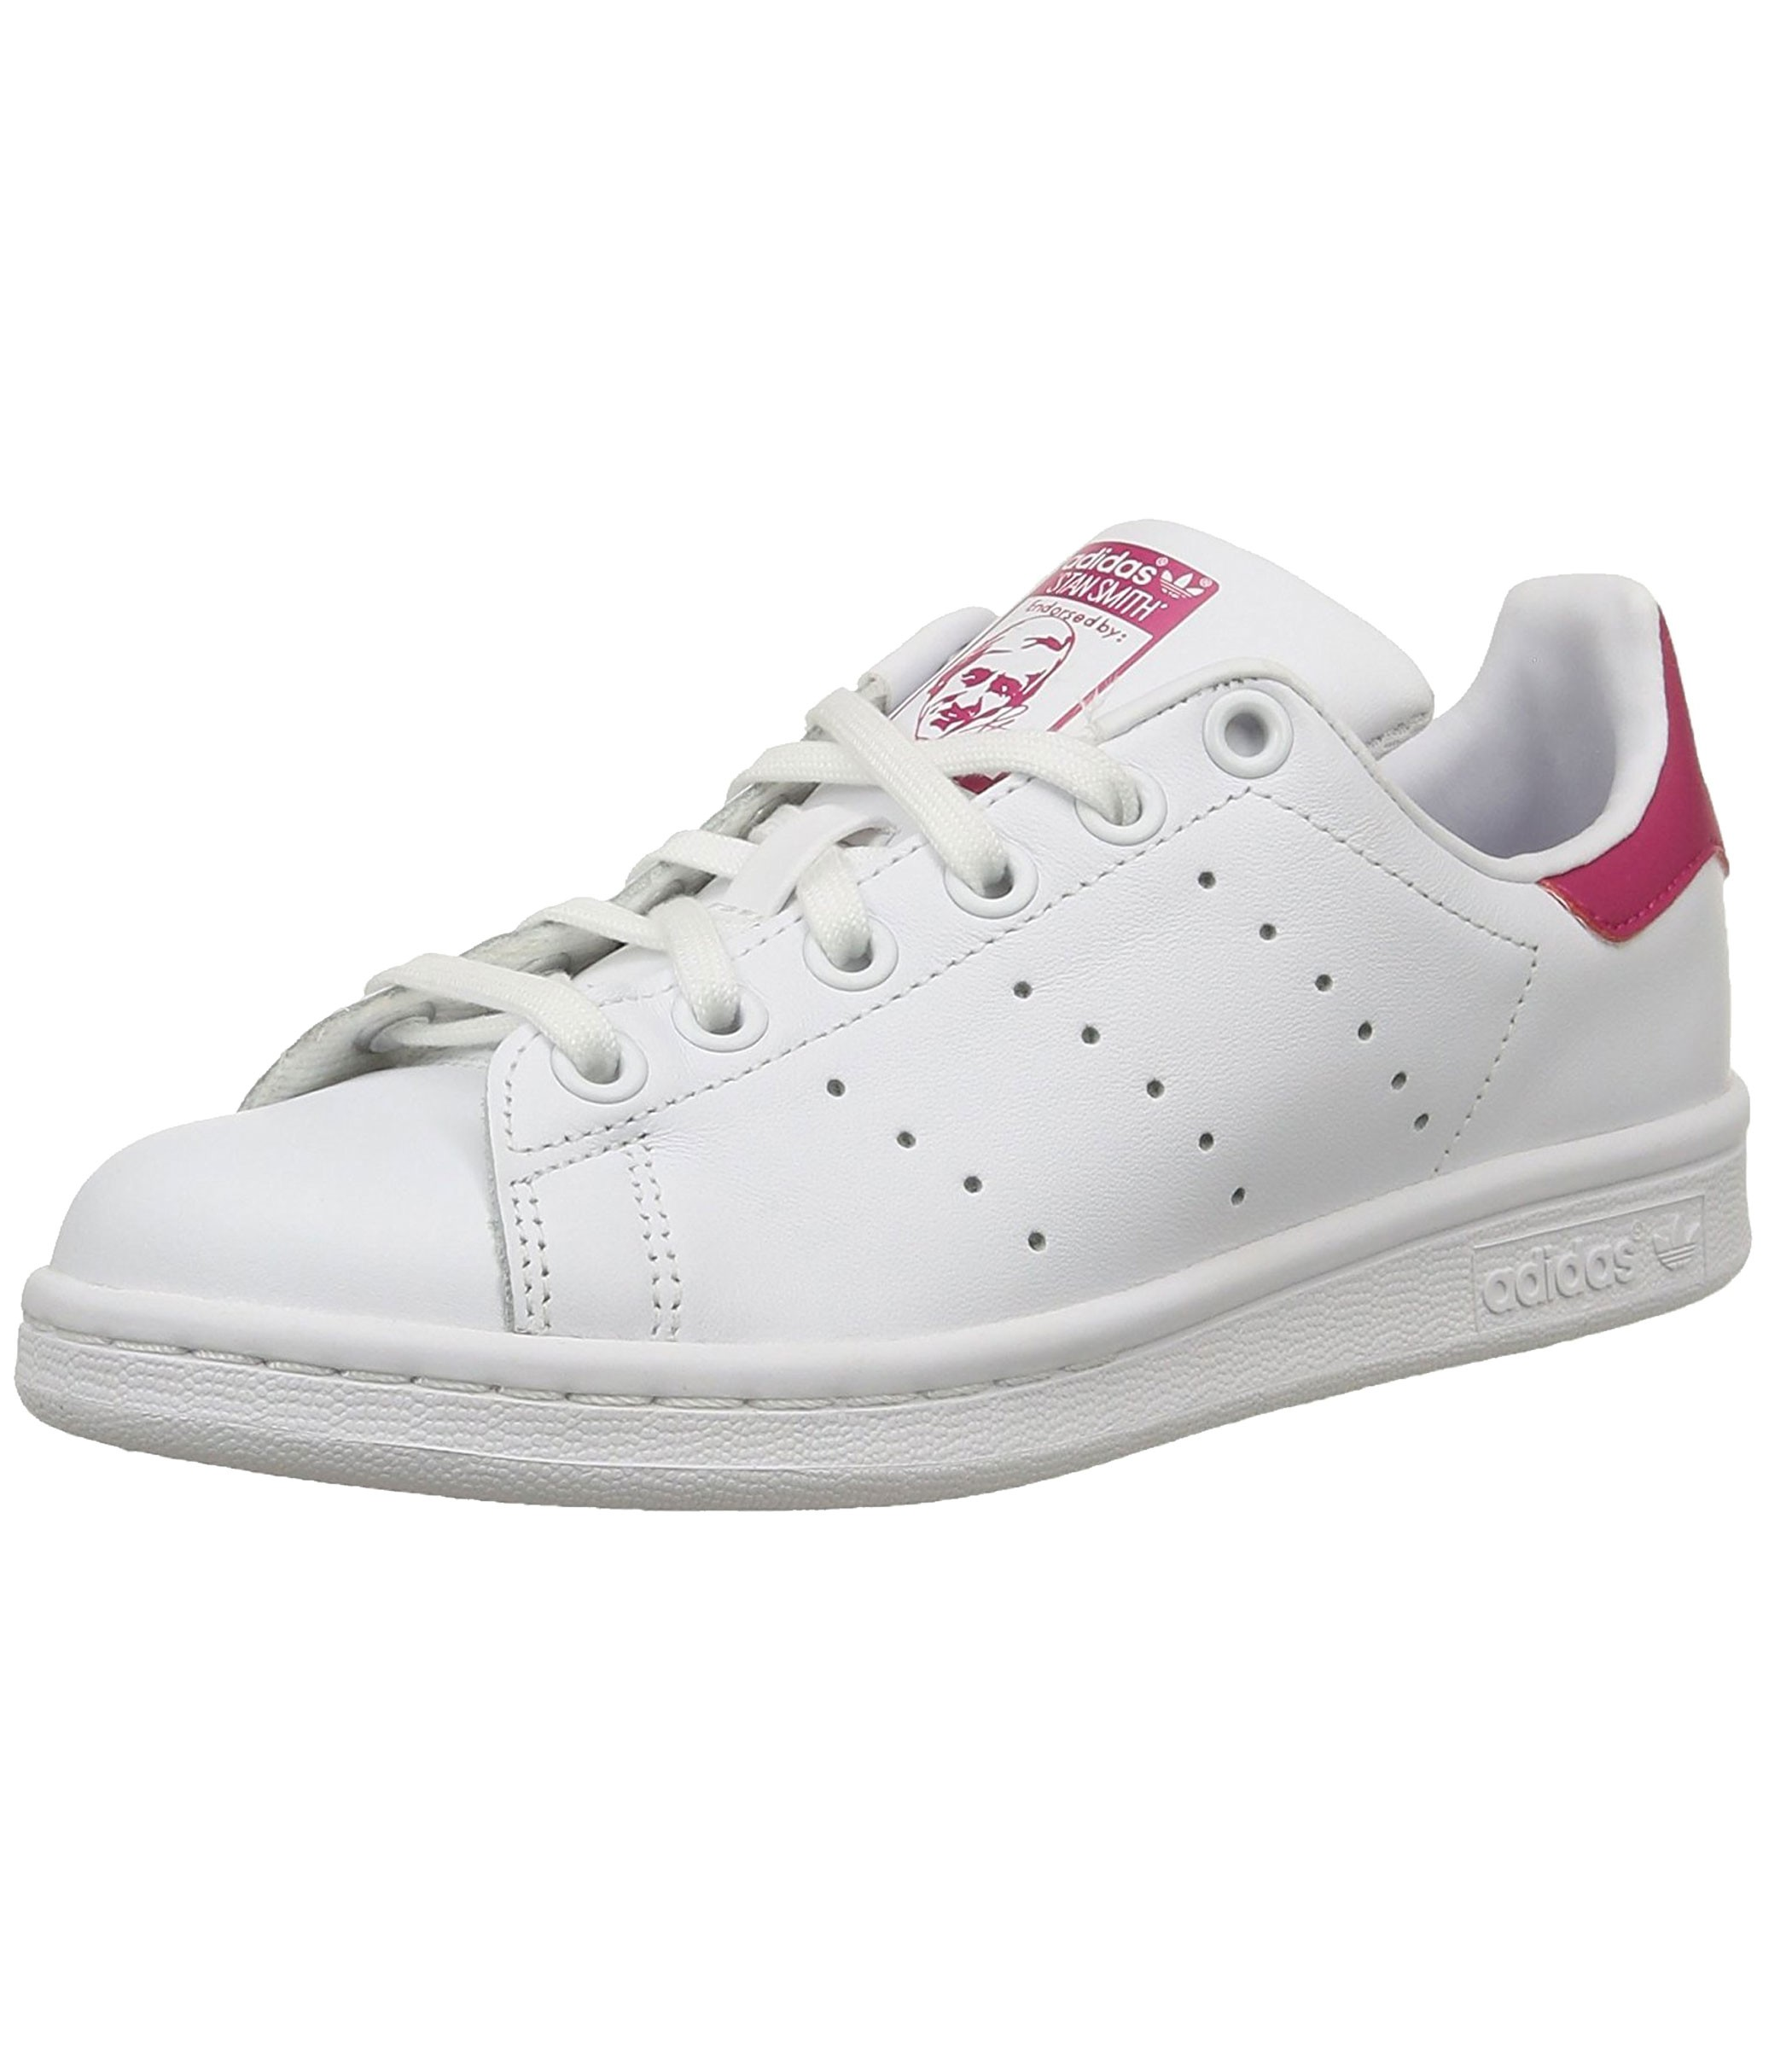 quality design c2977 cfeb6 Sneakers Da B32703 Rif Adidas Smith Stan Scarpe Ragazza dn61